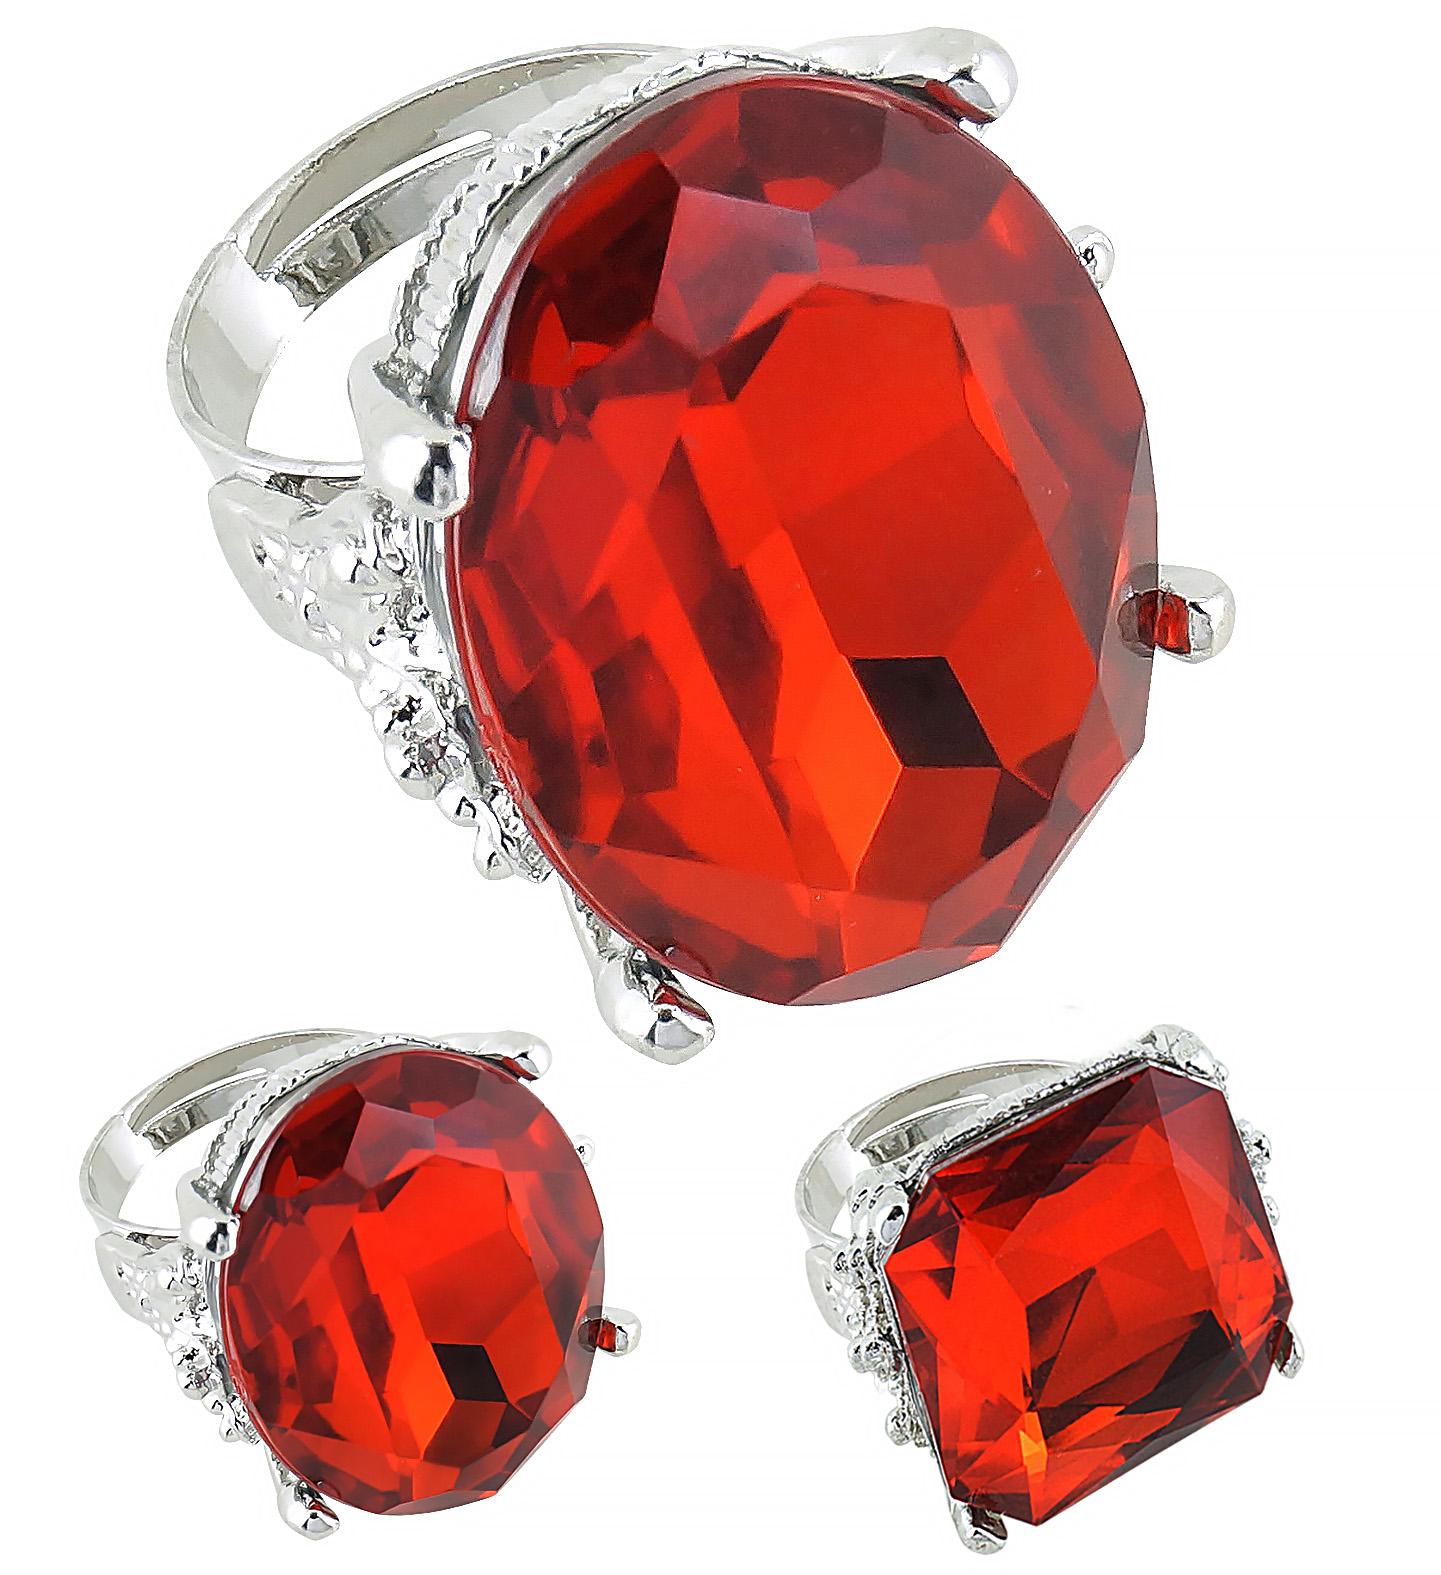 Jumbo Luxus Ring, ROT, Dracula, Graf Gothic,oval,rund,eckig Herren